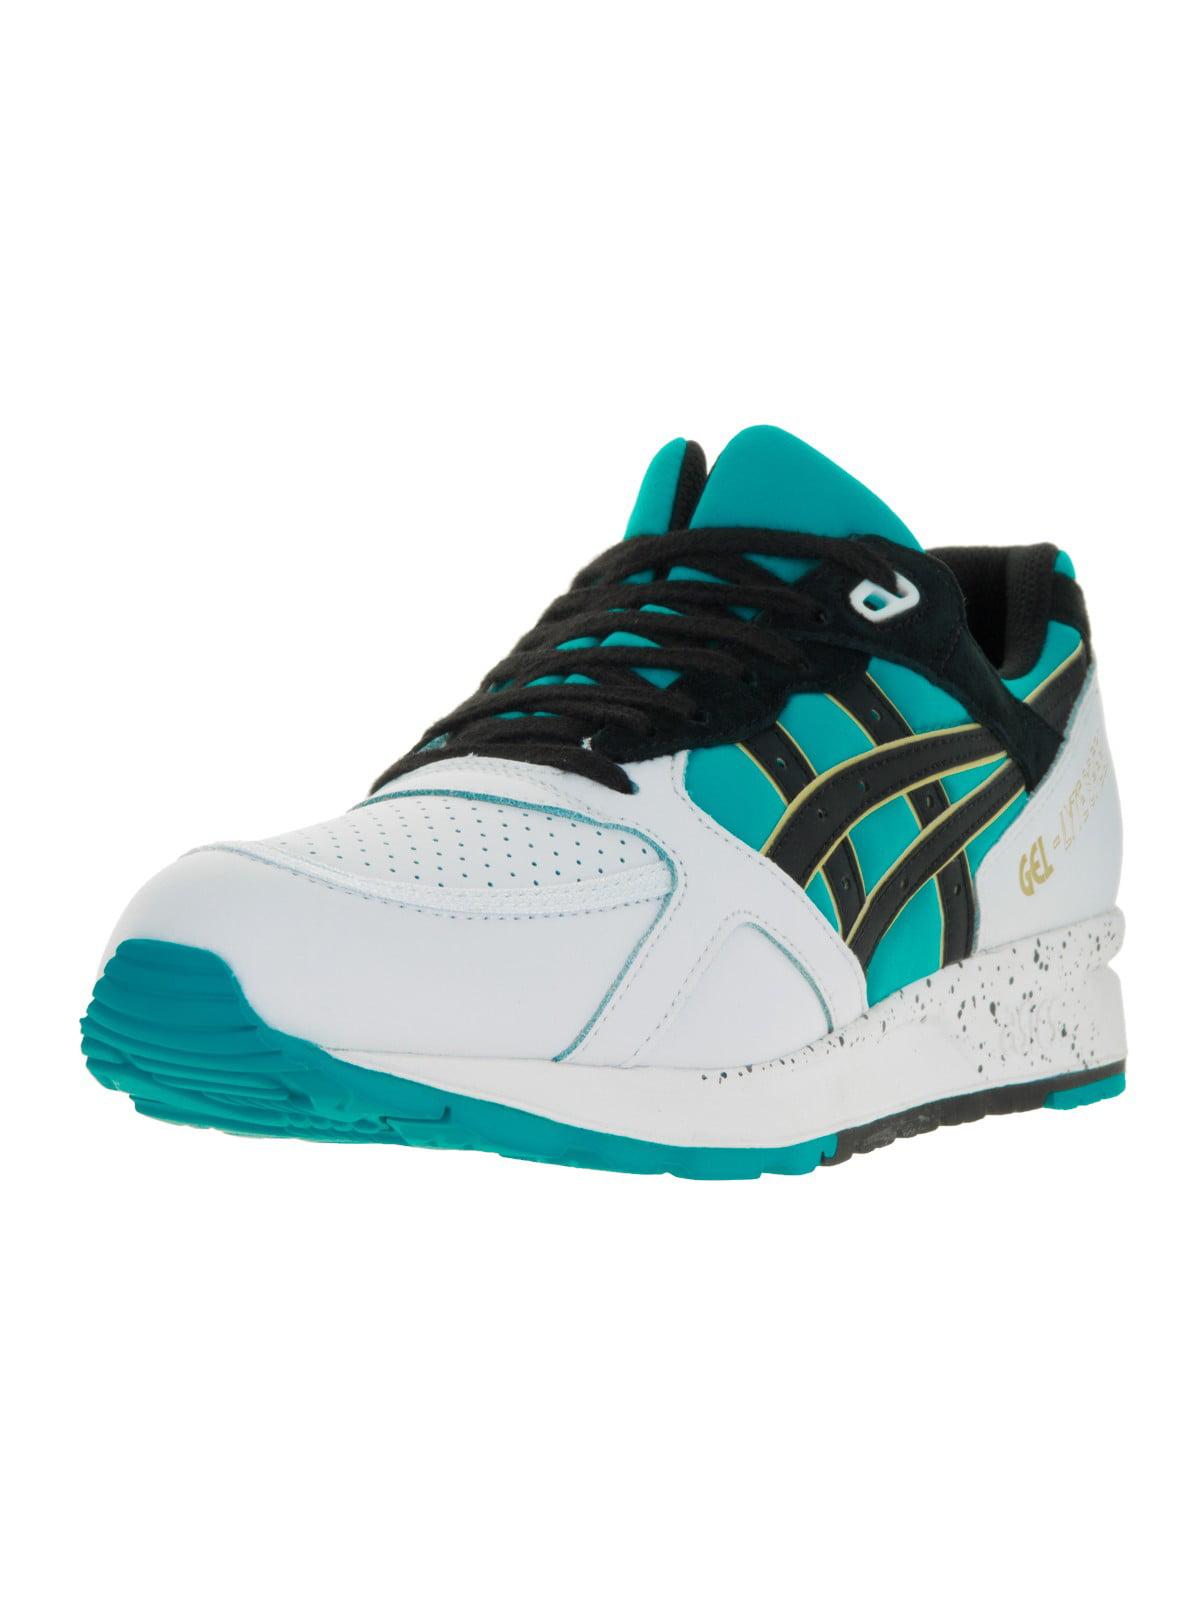 cc34af01537a ASICS - Asics Men s Gel-Lyte Speed Running Shoe - Walmart.com